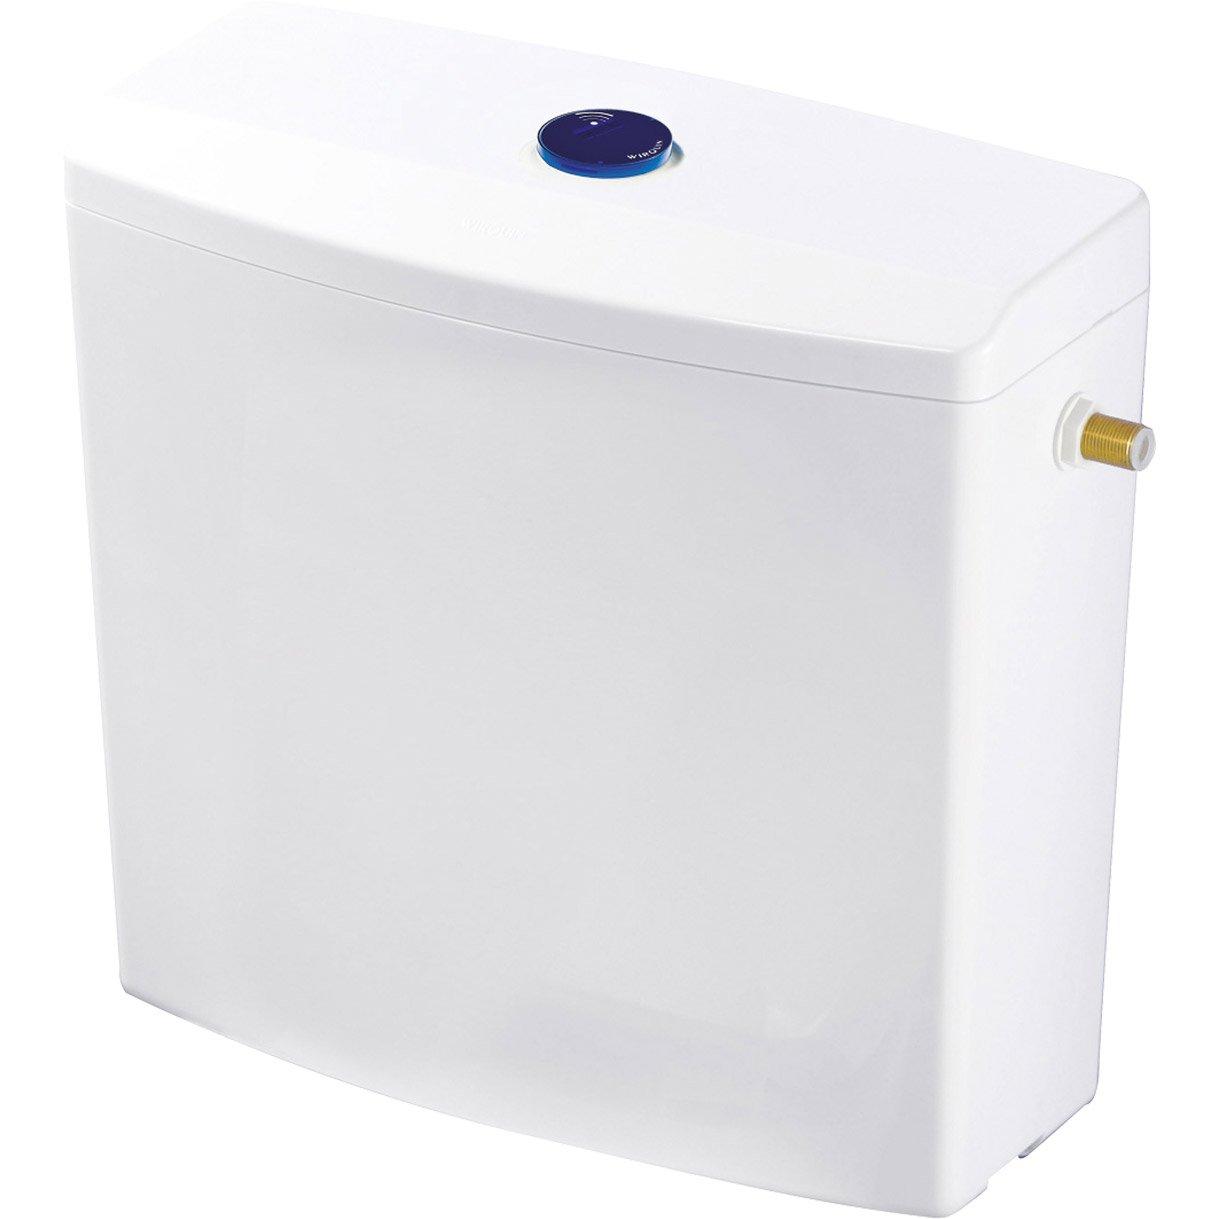 fuite cuvette wc plombier qui rpare une toilette qui fuit. Black Bedroom Furniture Sets. Home Design Ideas